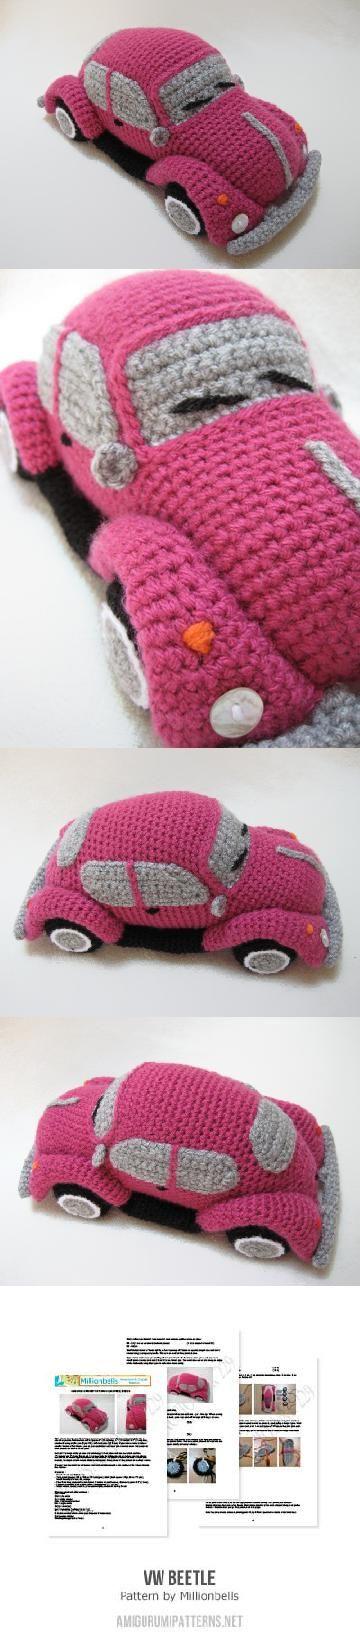 Amigurumi Beetle : VW (inspired) Beetle Bug amigurumi pattern by Millionbells ...